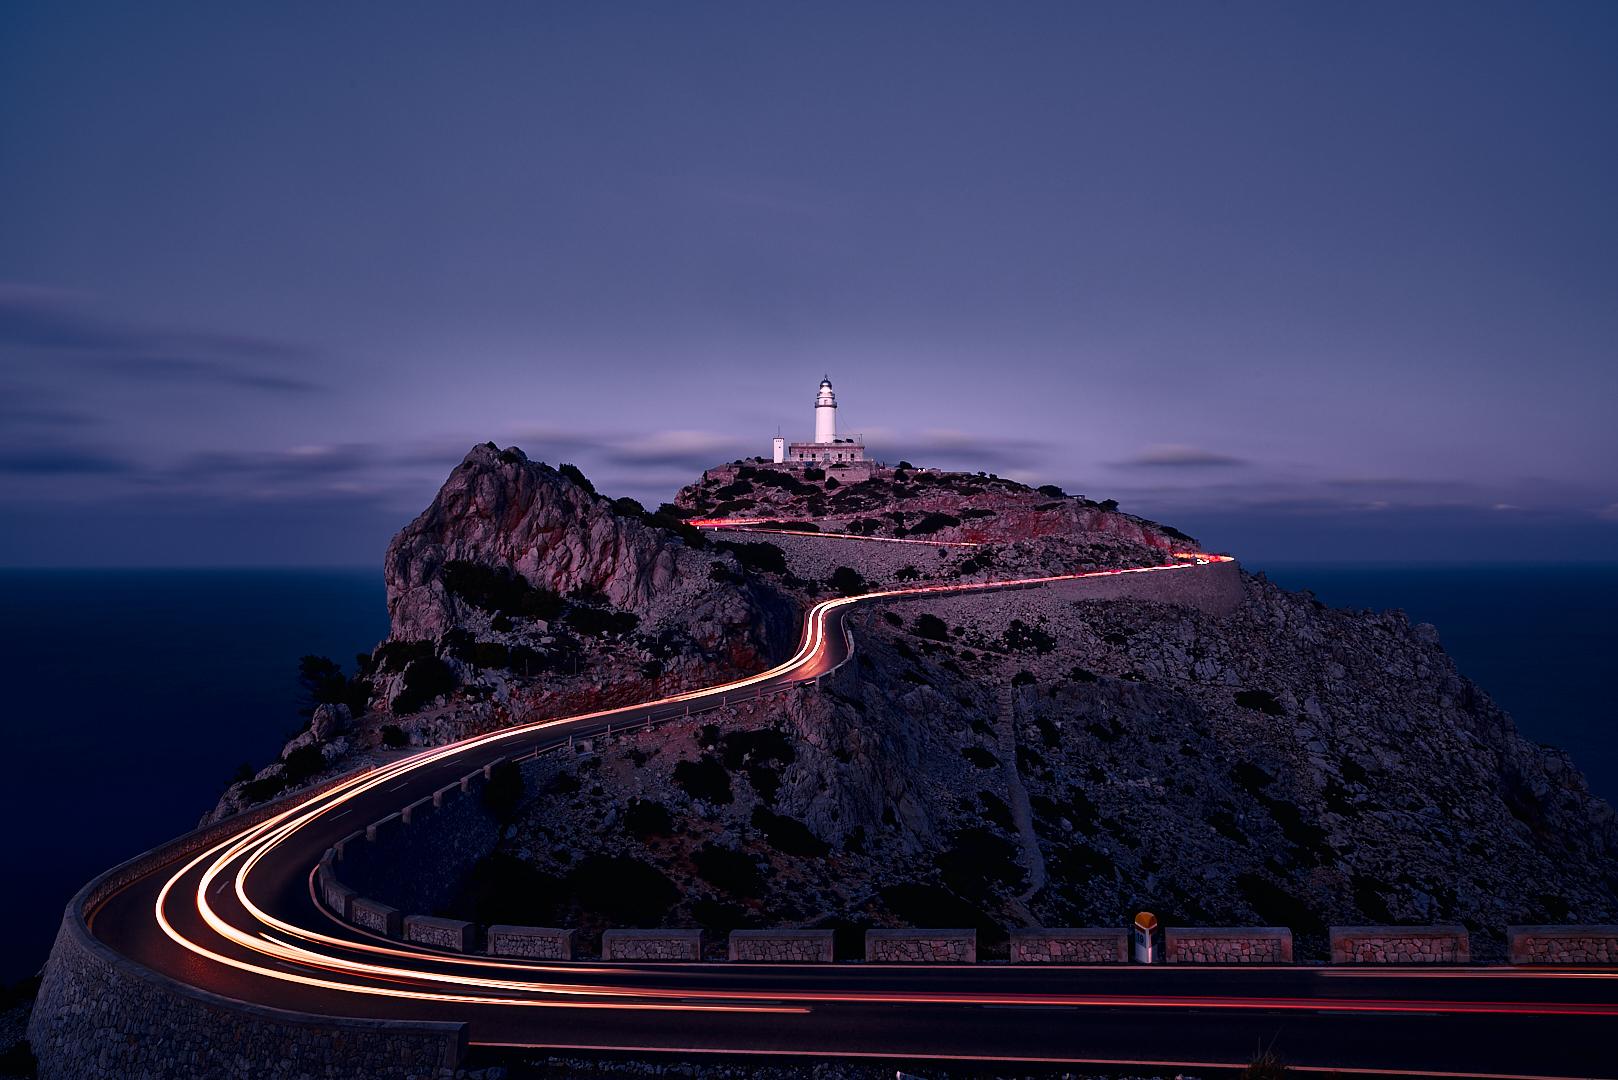 Cap de Formentor lighthouse, Spain